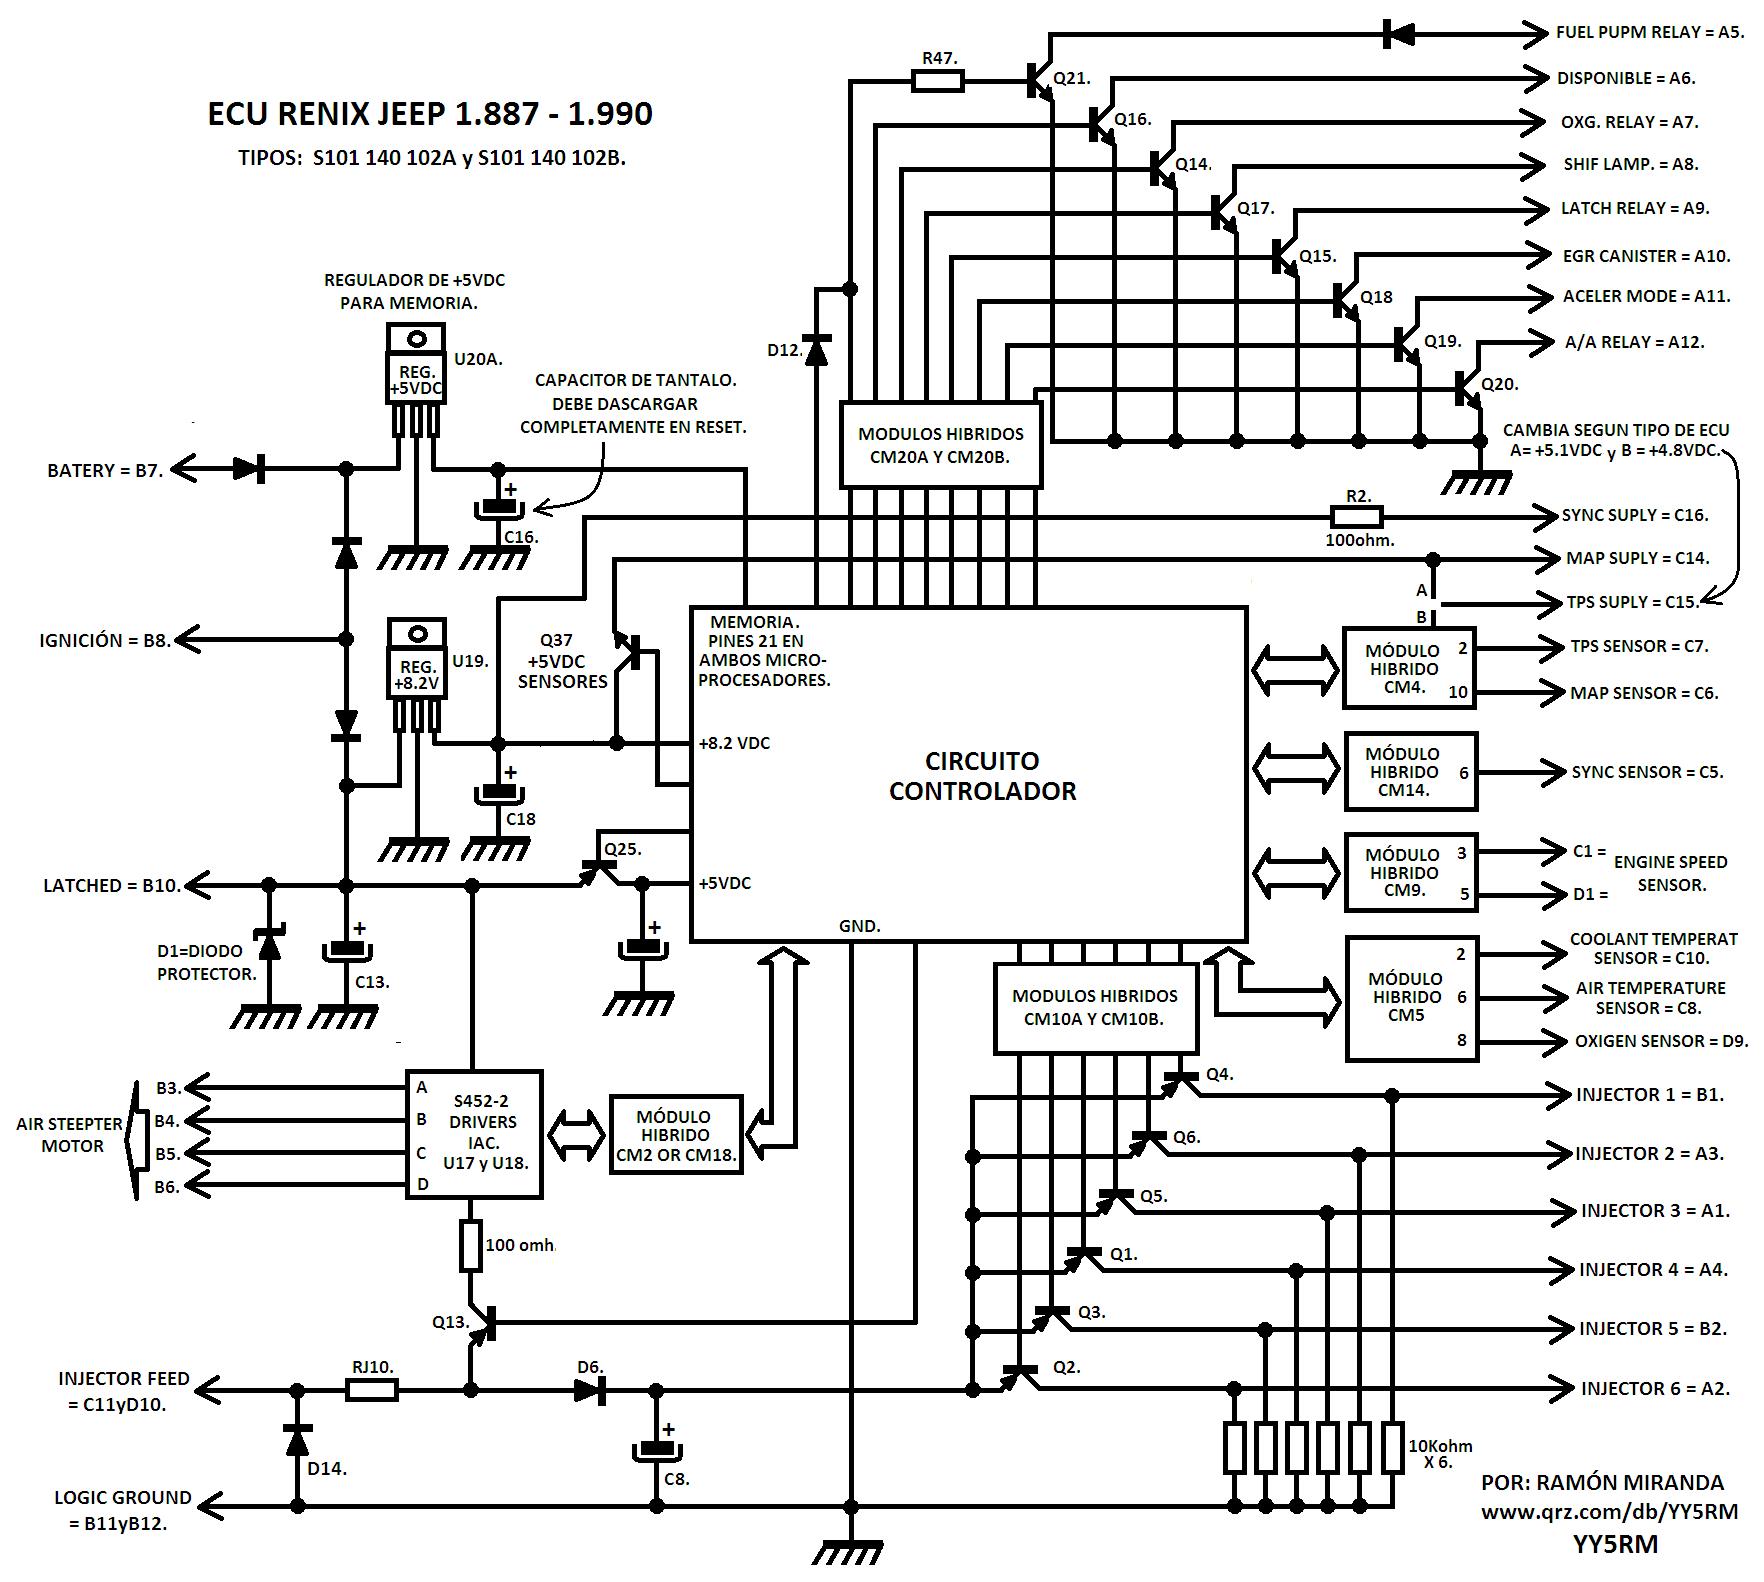 ECU Renix Jeep 88 90 Diagrama — imgbb.com